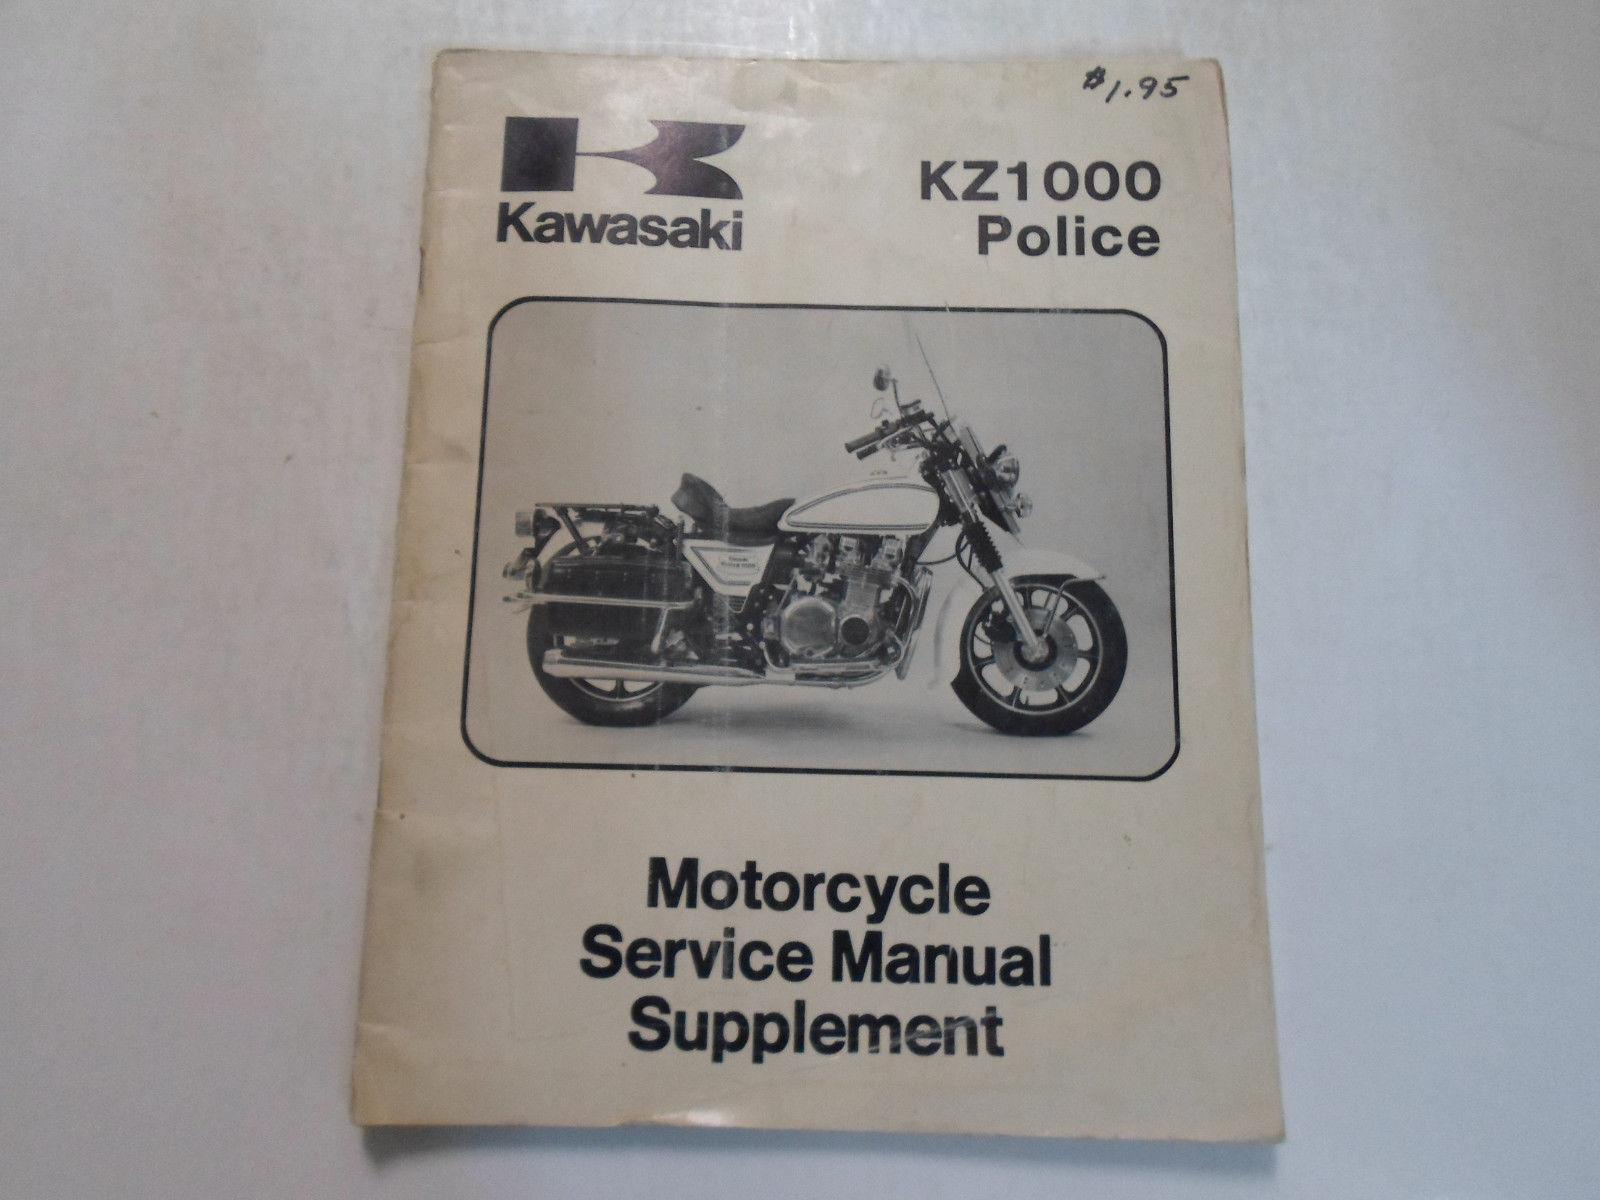 1984 Kawasaki Kz1000 Police Service Manual and similar items